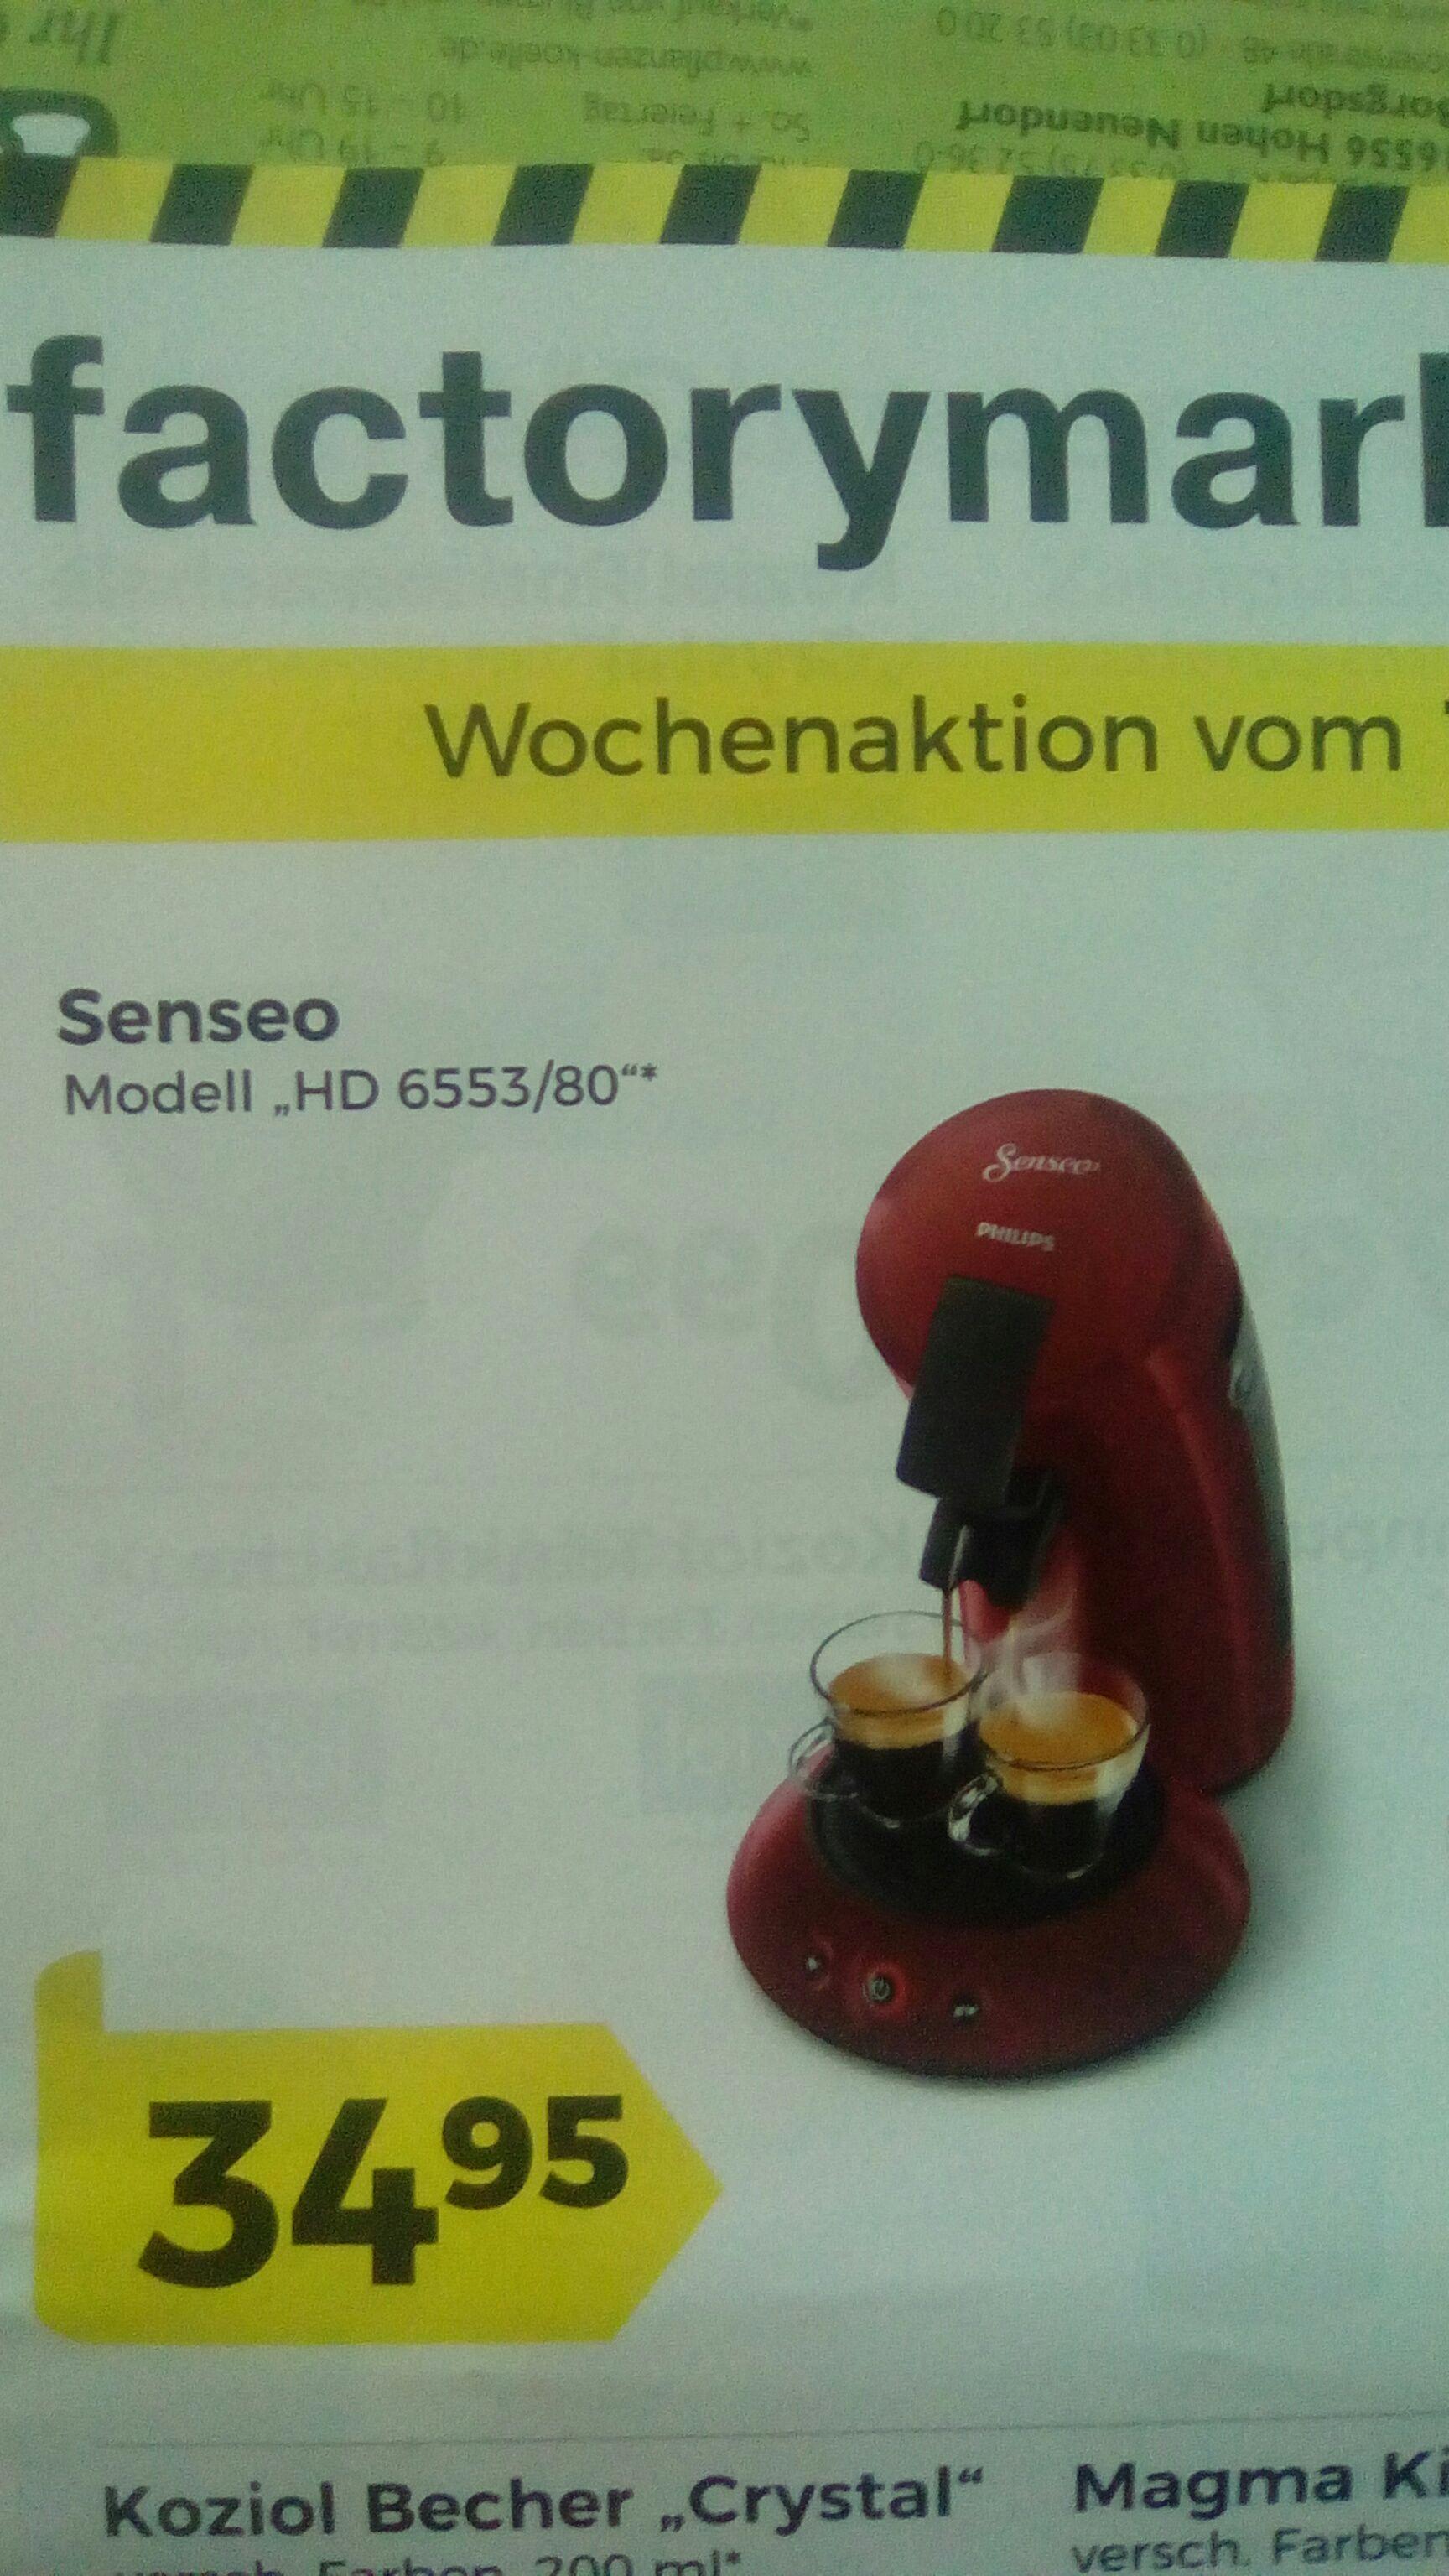 (Lokal Berlin) Senseo HD 6553/80 für 31,95